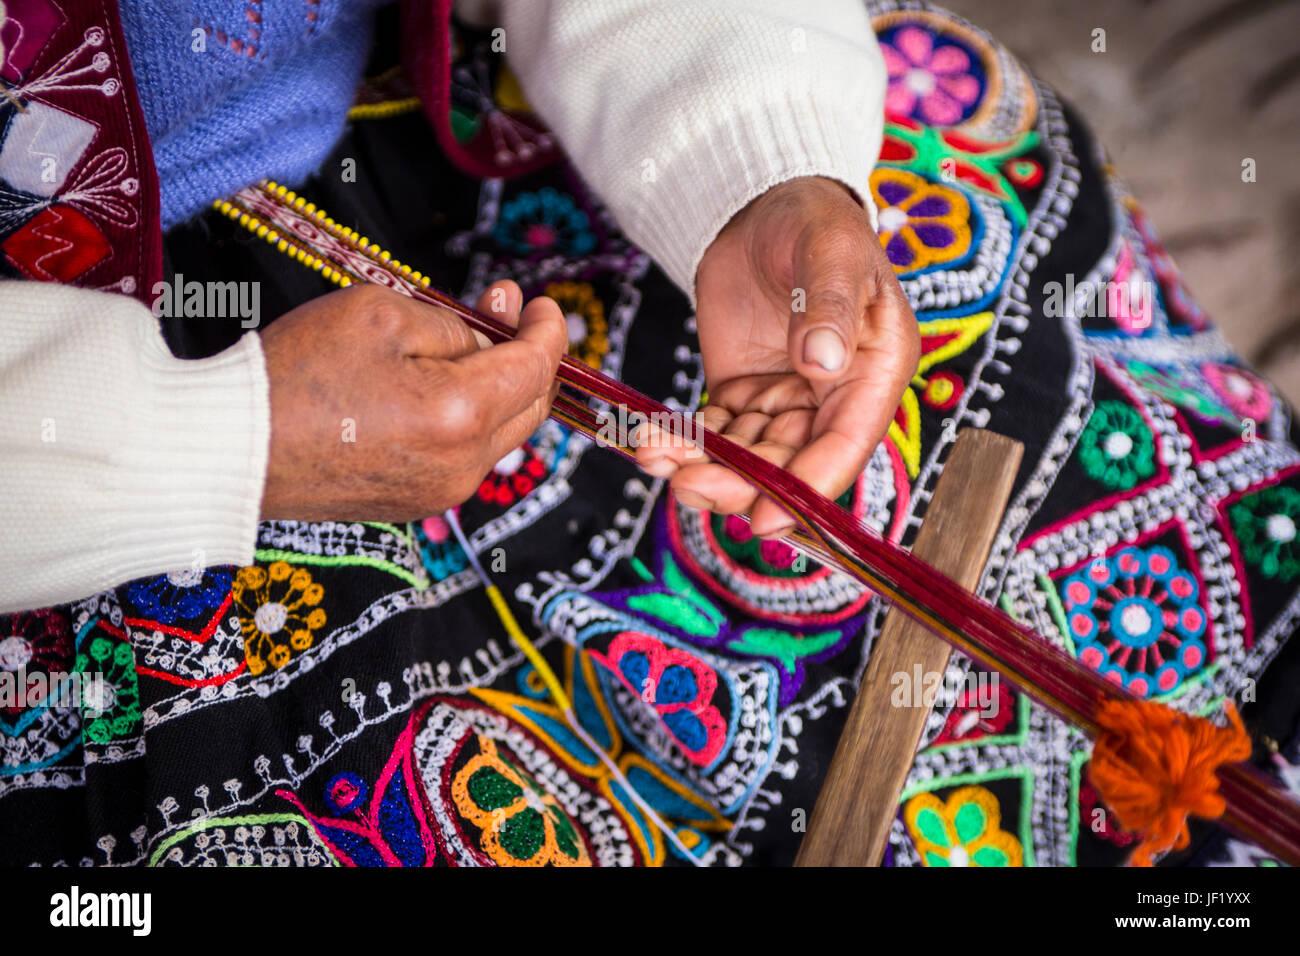 Close-up Of Peruvian Woman Weaving - Stock Image